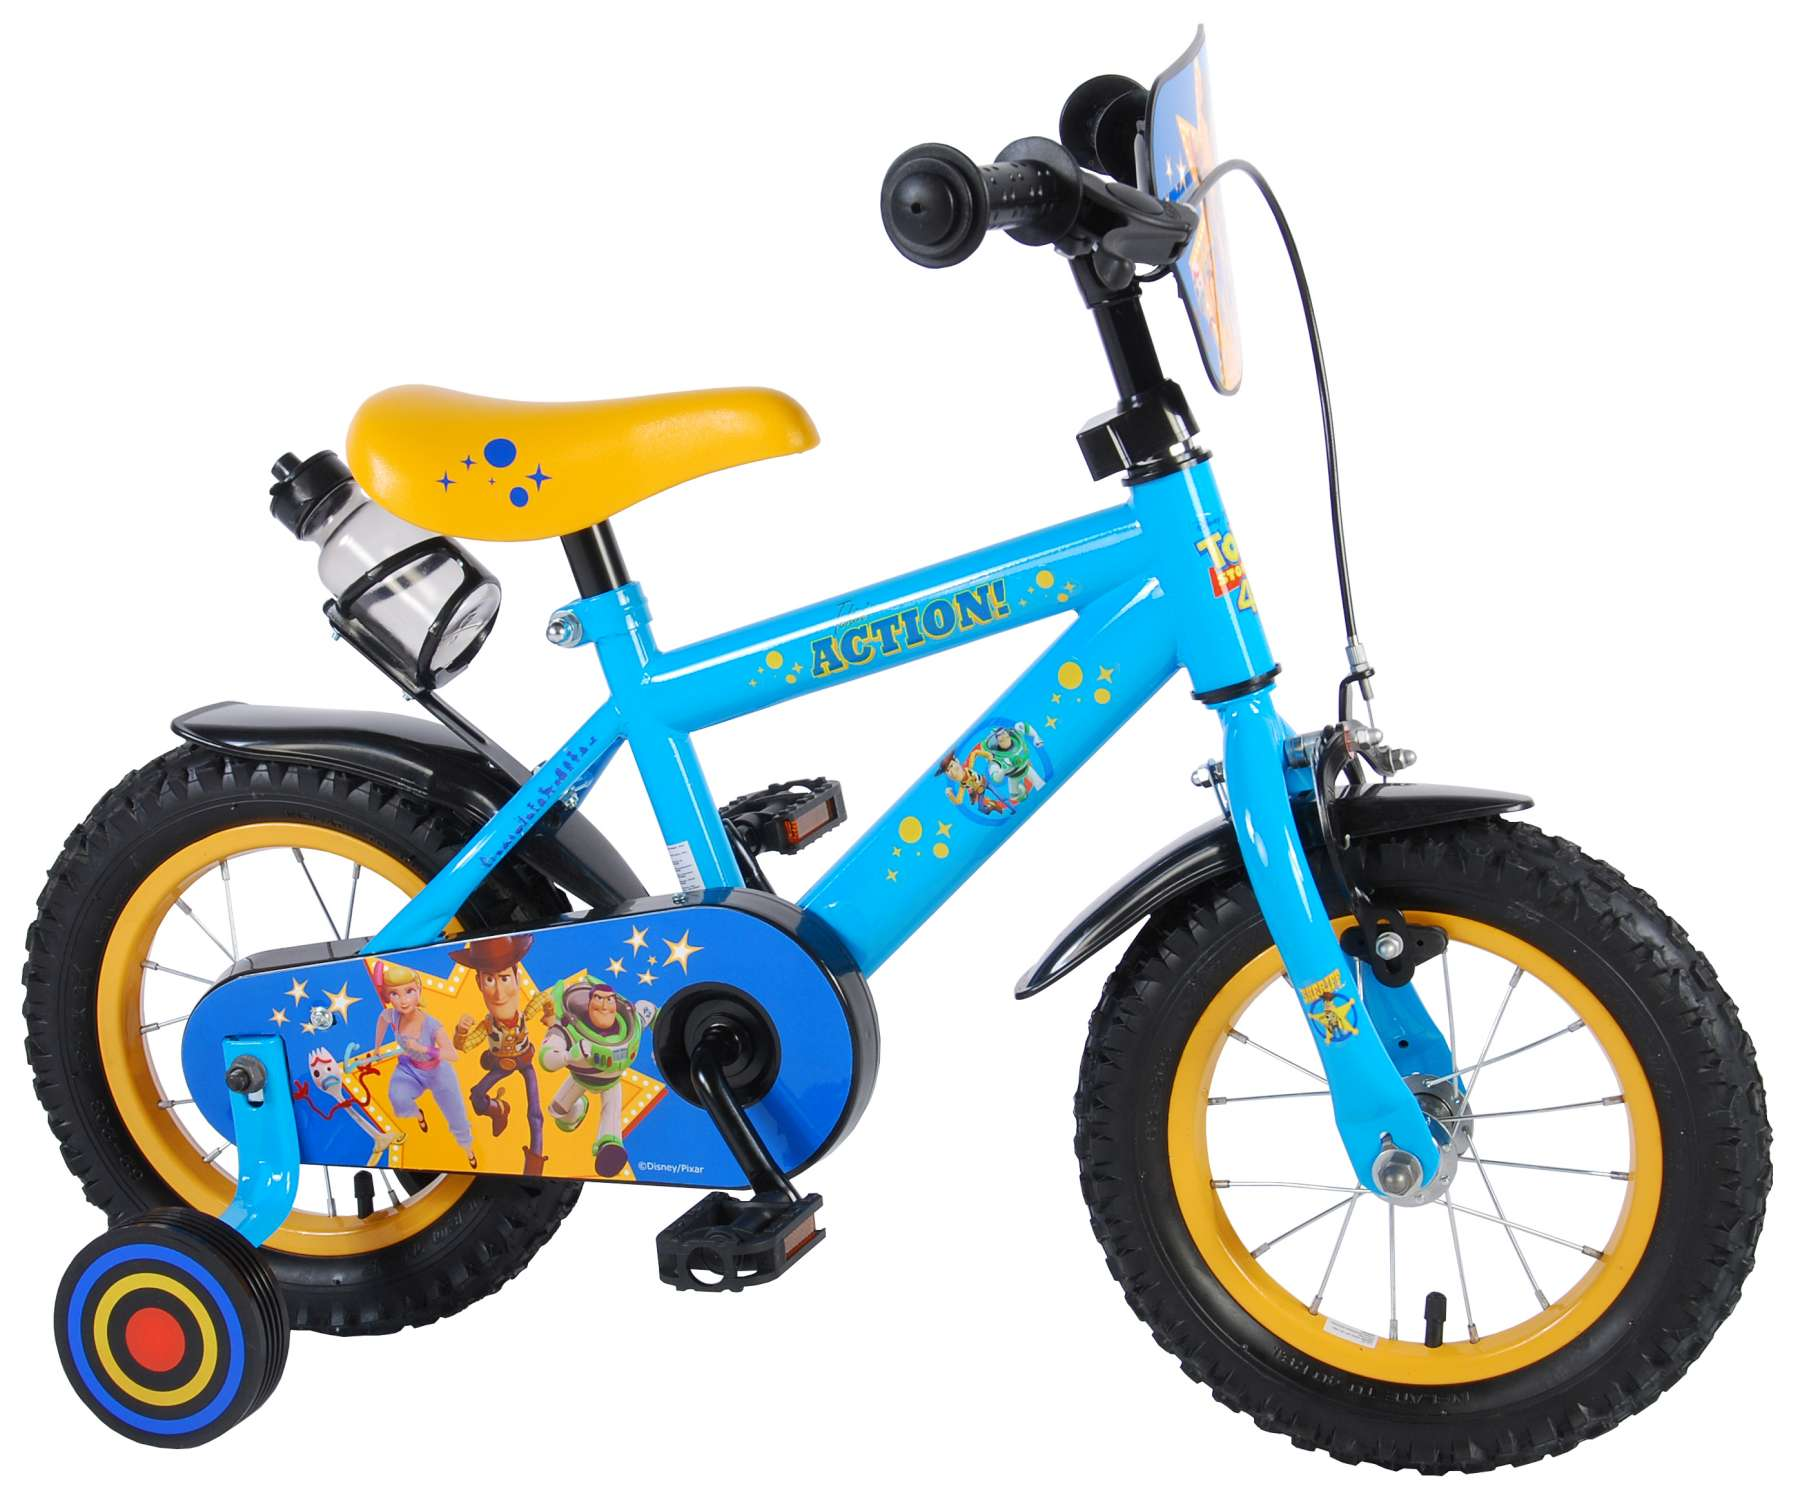 Volare - Detský bicykel pre deti , Disney Toy Story, 12